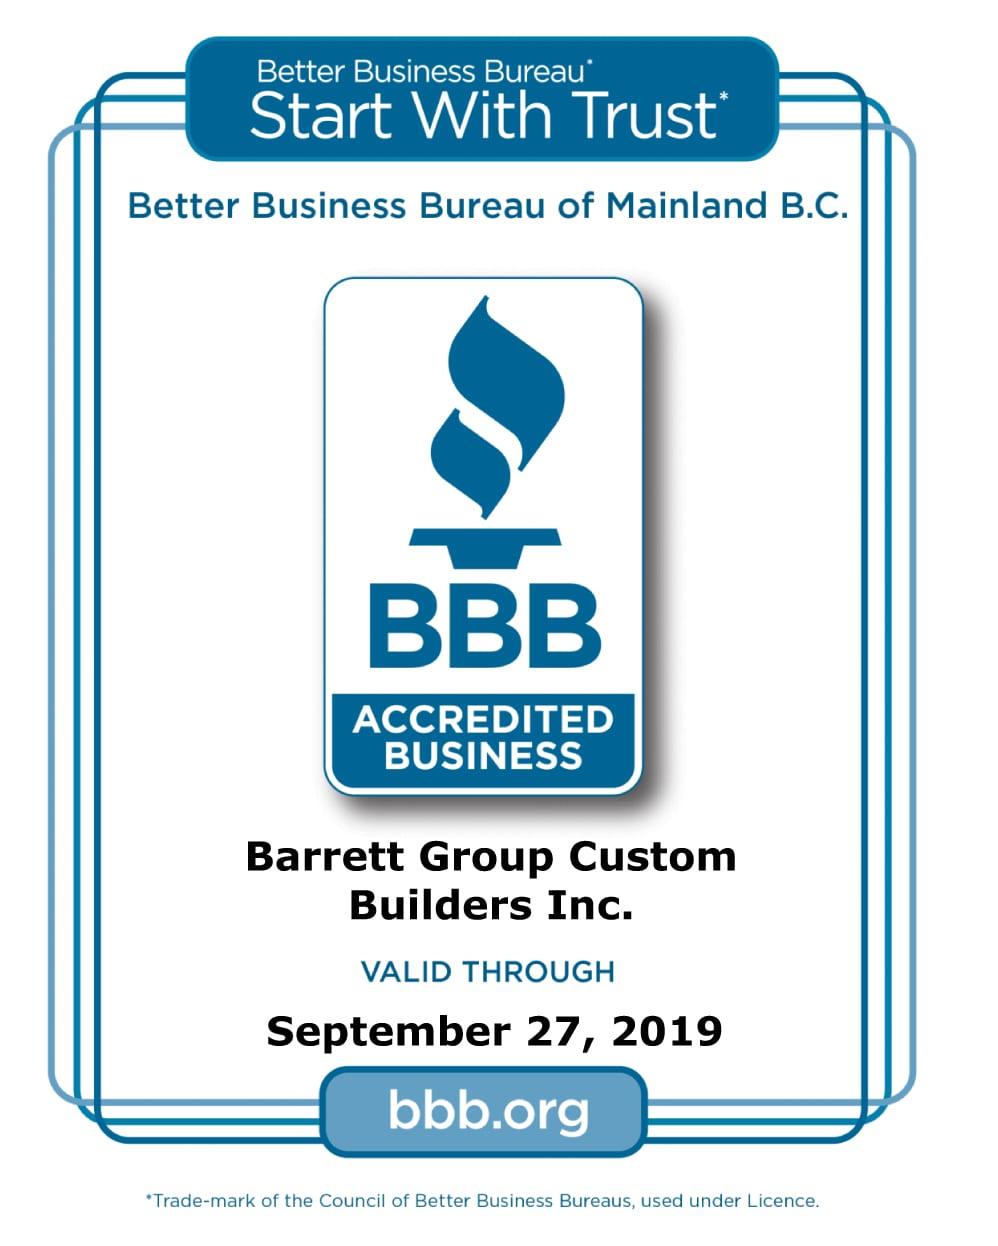 better business bureau of mainland bc barrett group. Black Bedroom Furniture Sets. Home Design Ideas